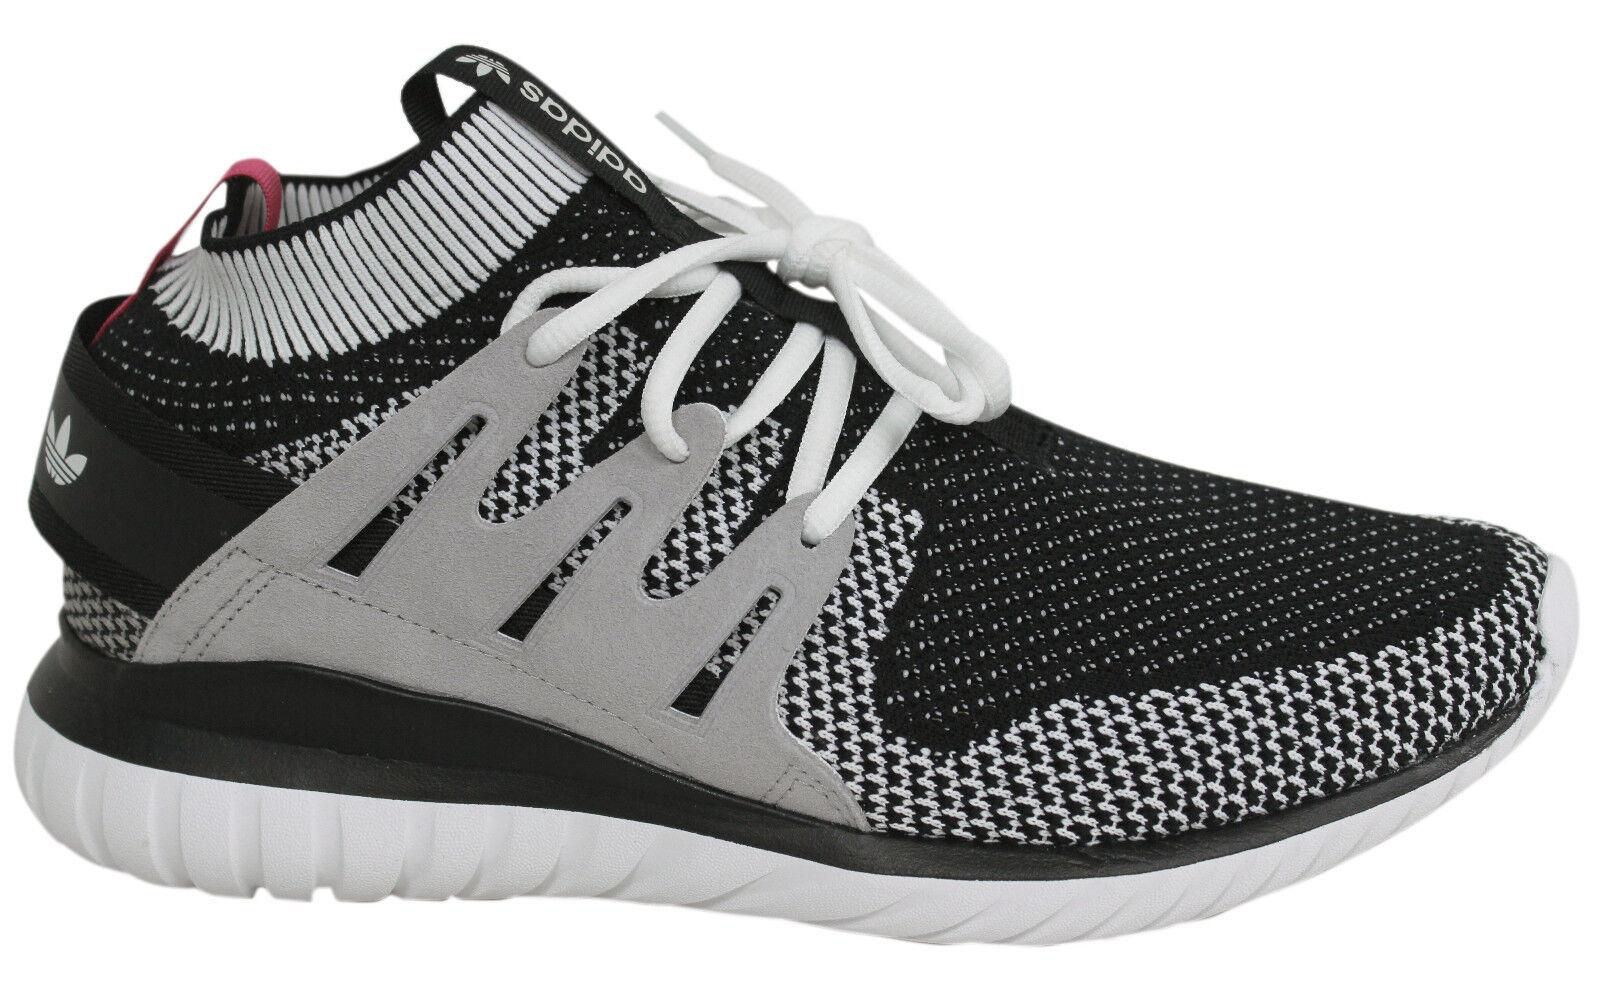 Adidas Tubular Nova PK Lace Up White Black Grey Sock Mens Trainers S74918 M9